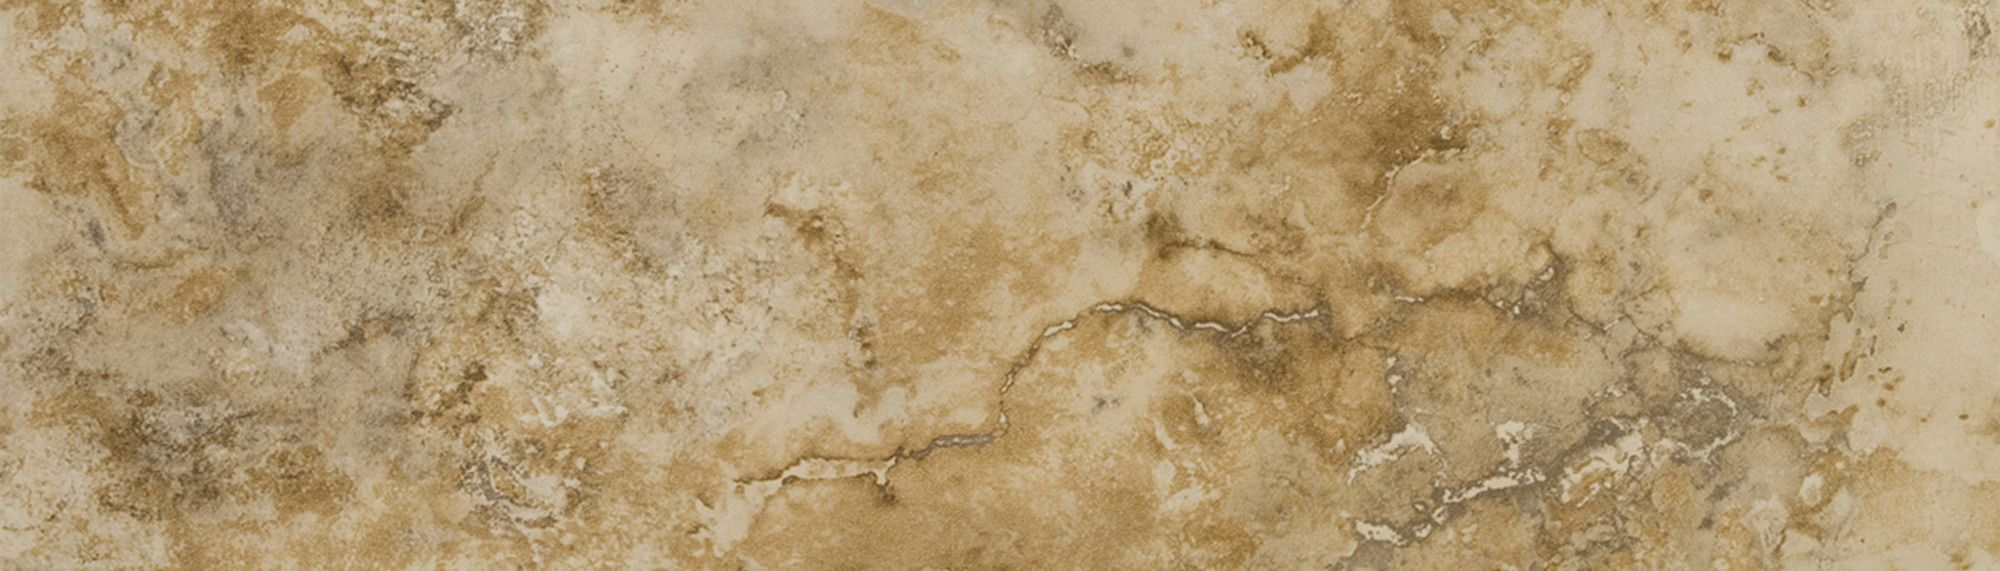 "Decorative Bullnose Tile Trim Endearing Rainier 13"" X 3"" Bullnose Tile Trim In Pinnacle  Products Review"